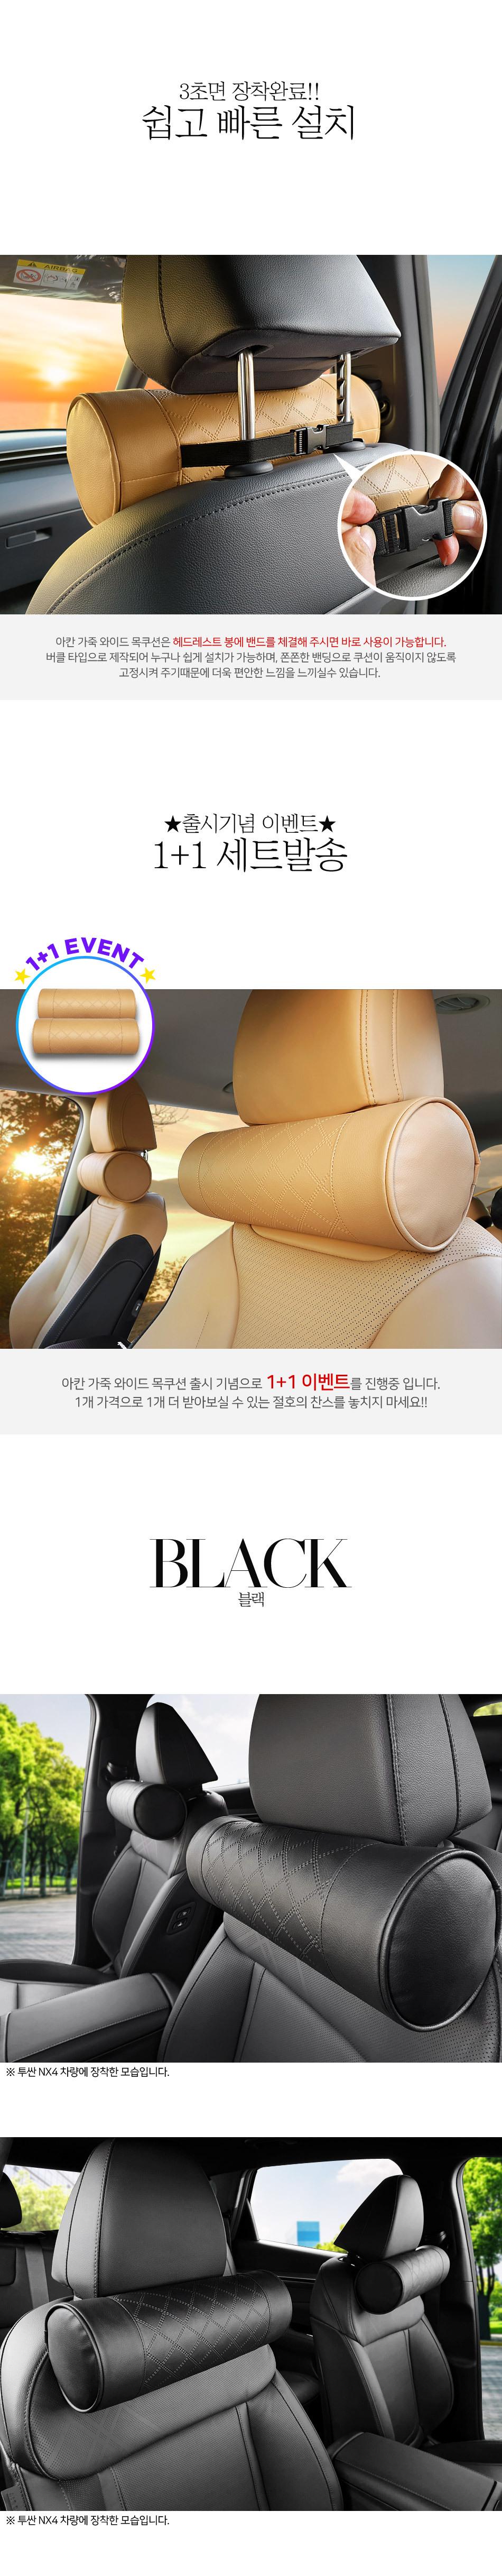 akan-leather-wide-neck-cushion_03.jpg